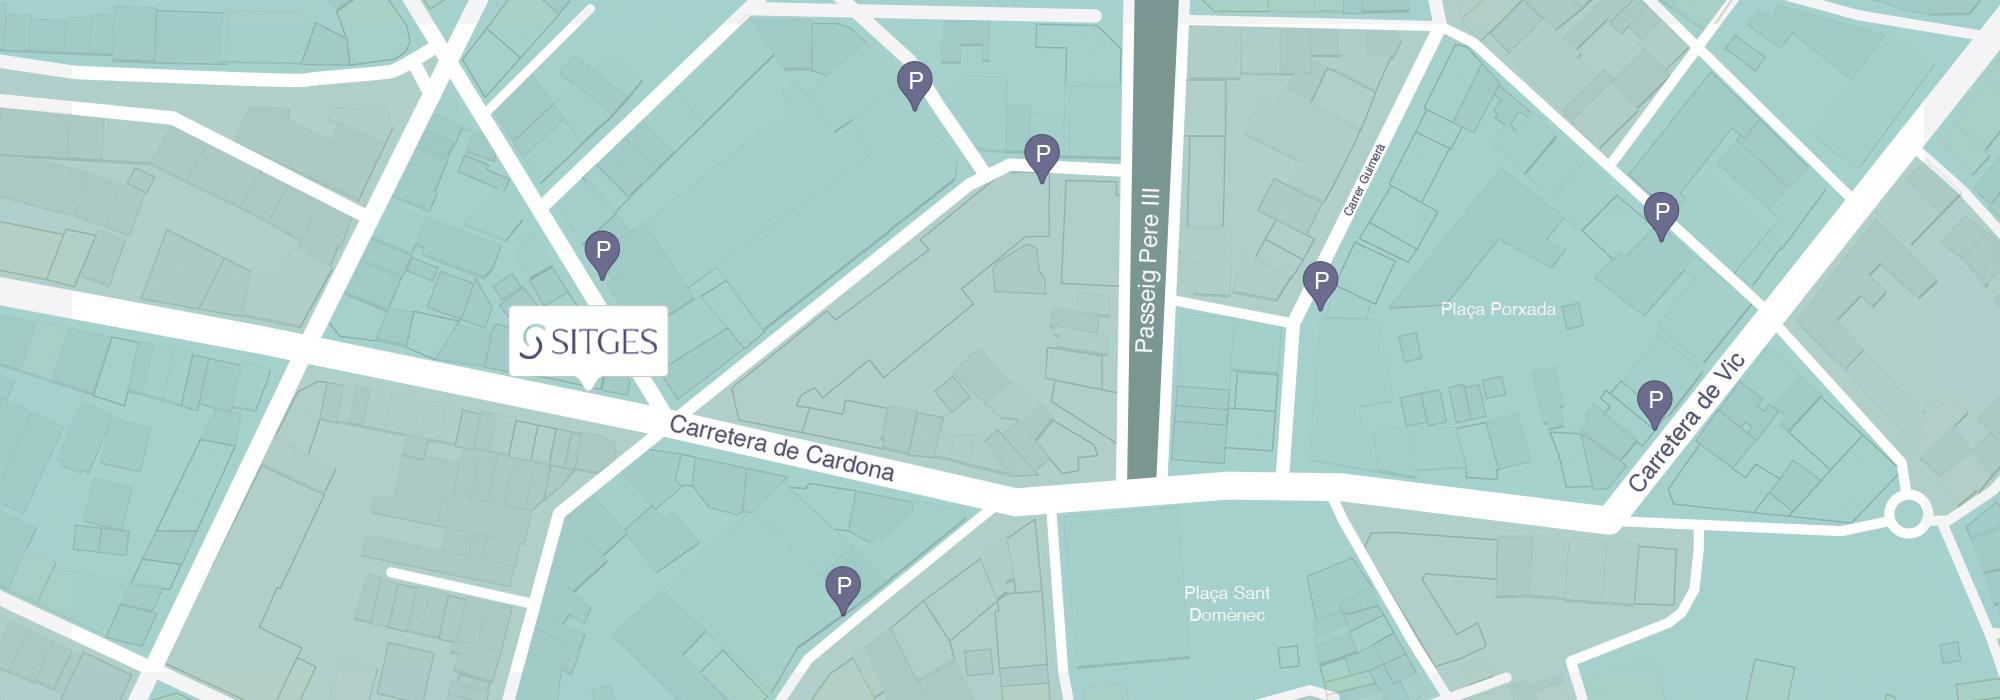 mapa-clinica-dental-doctor-sitges-manresa